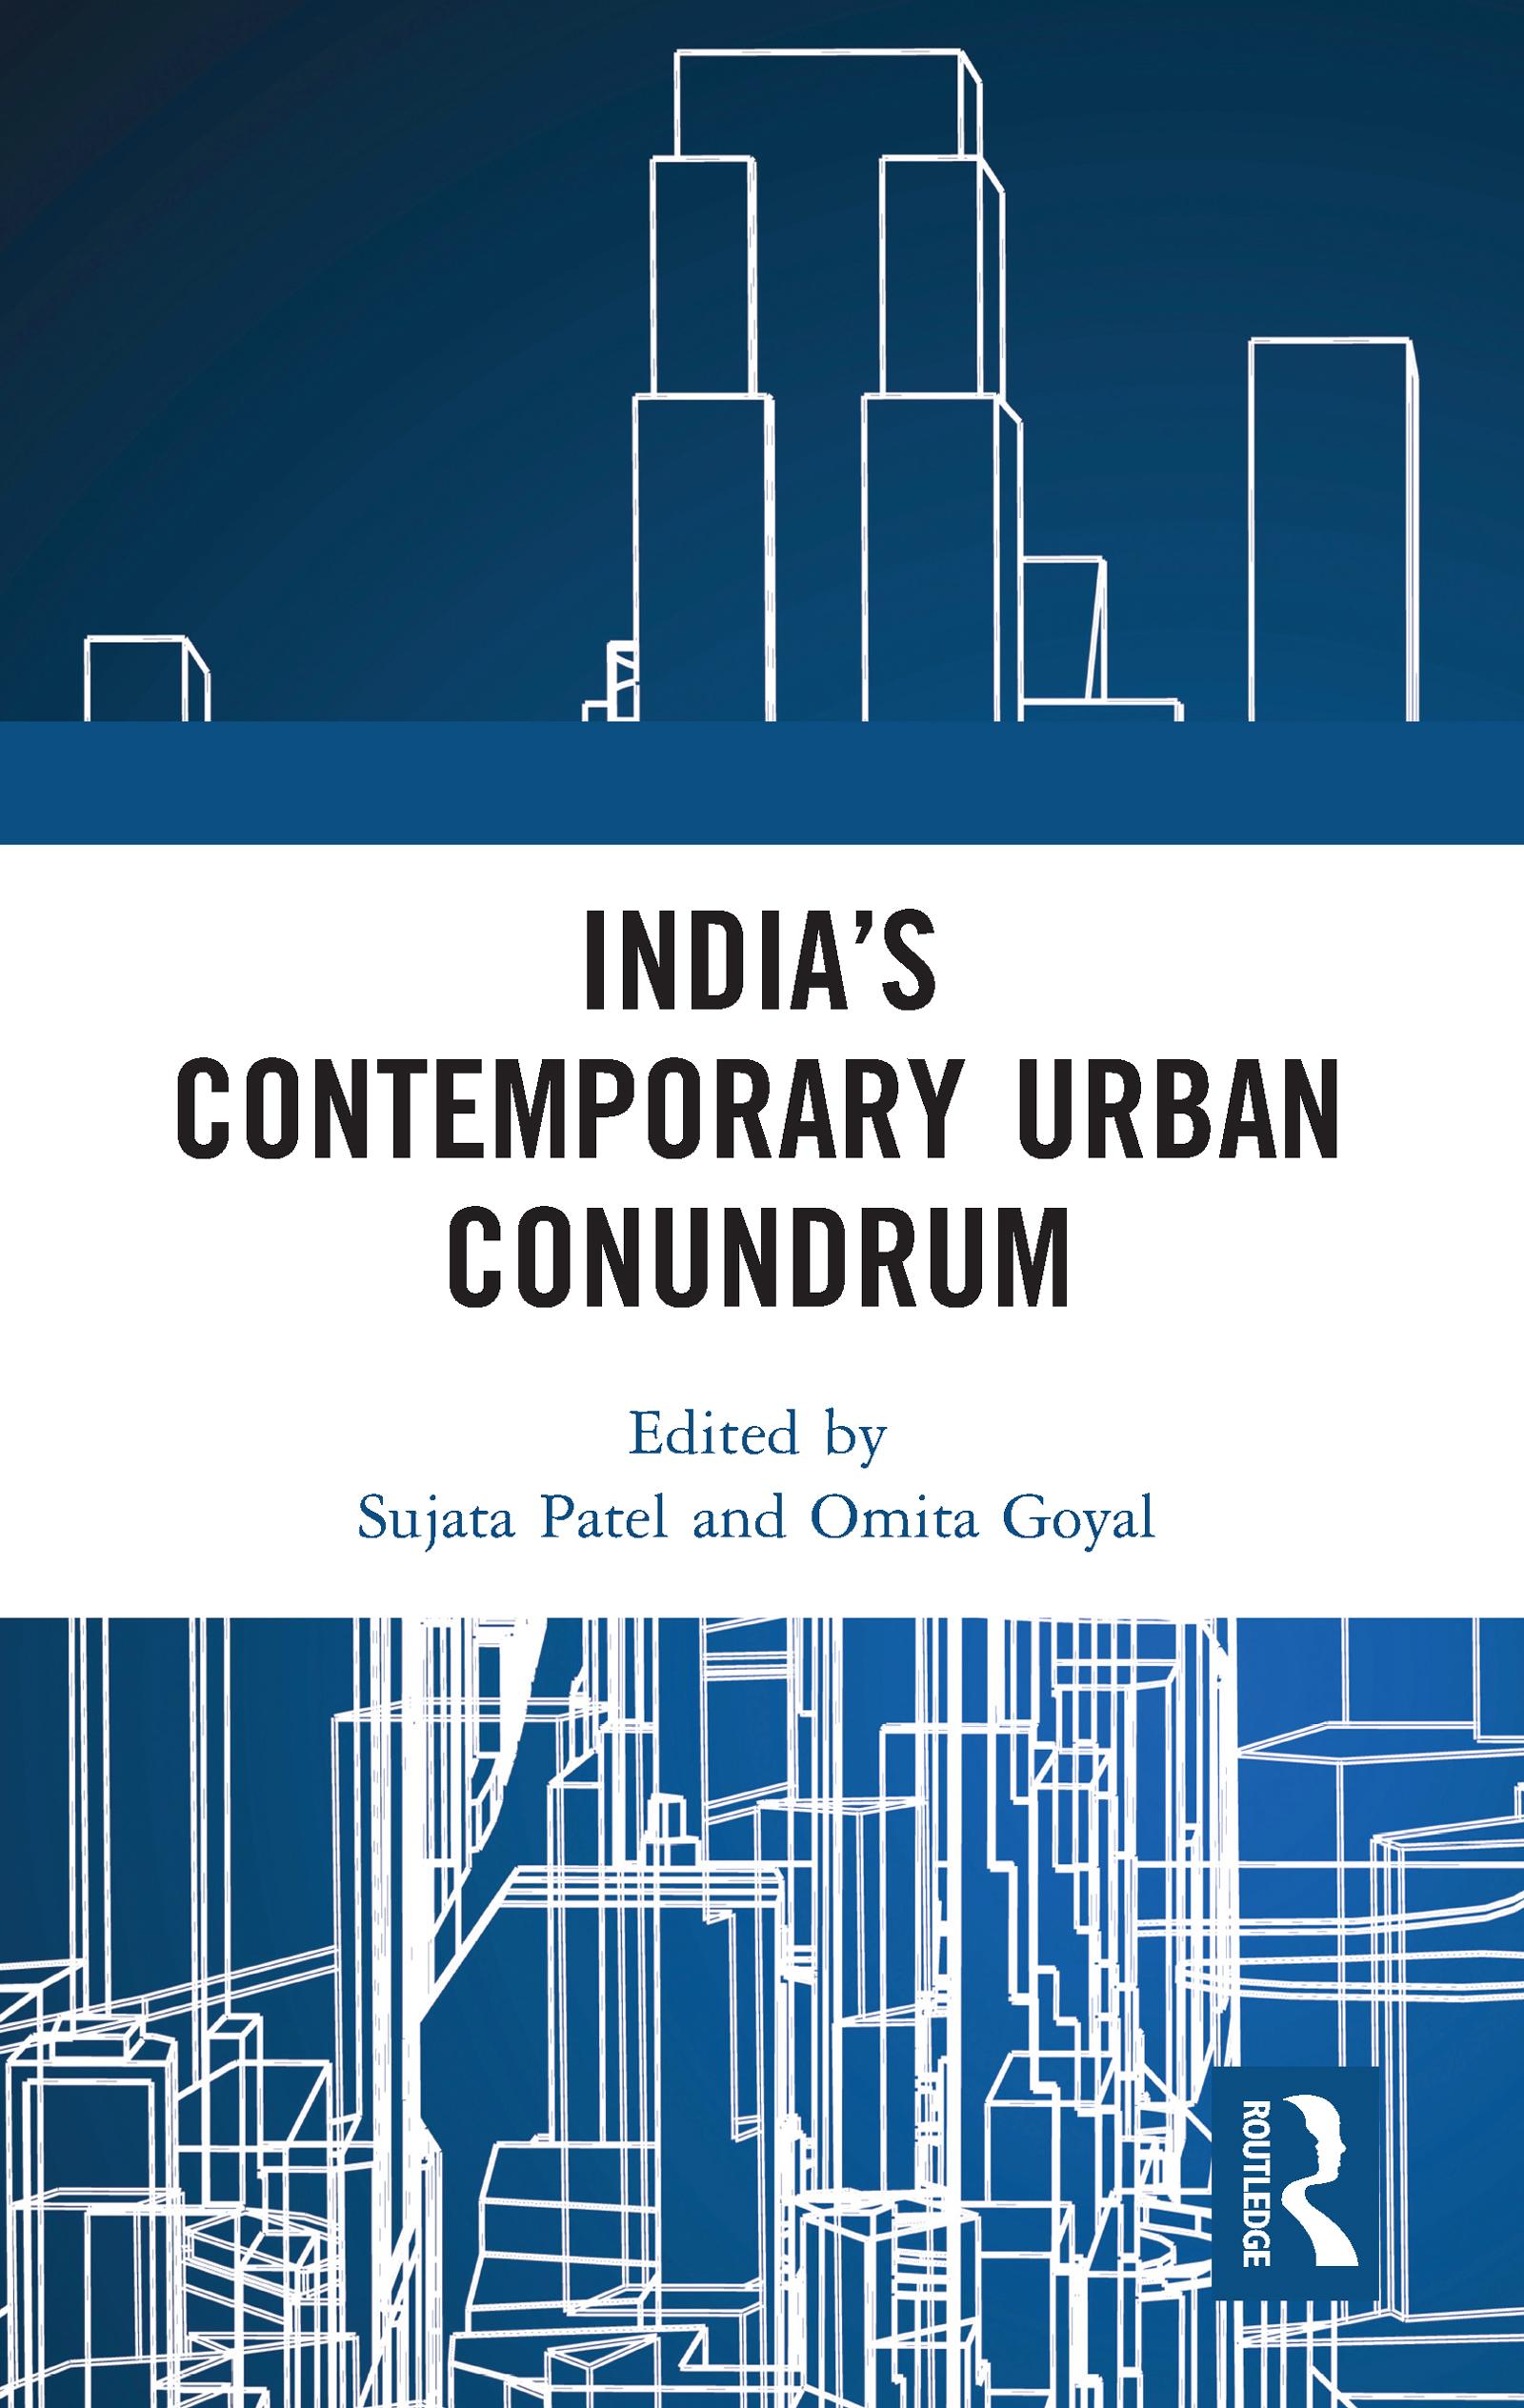 India's Contemporary Urban Conundrum